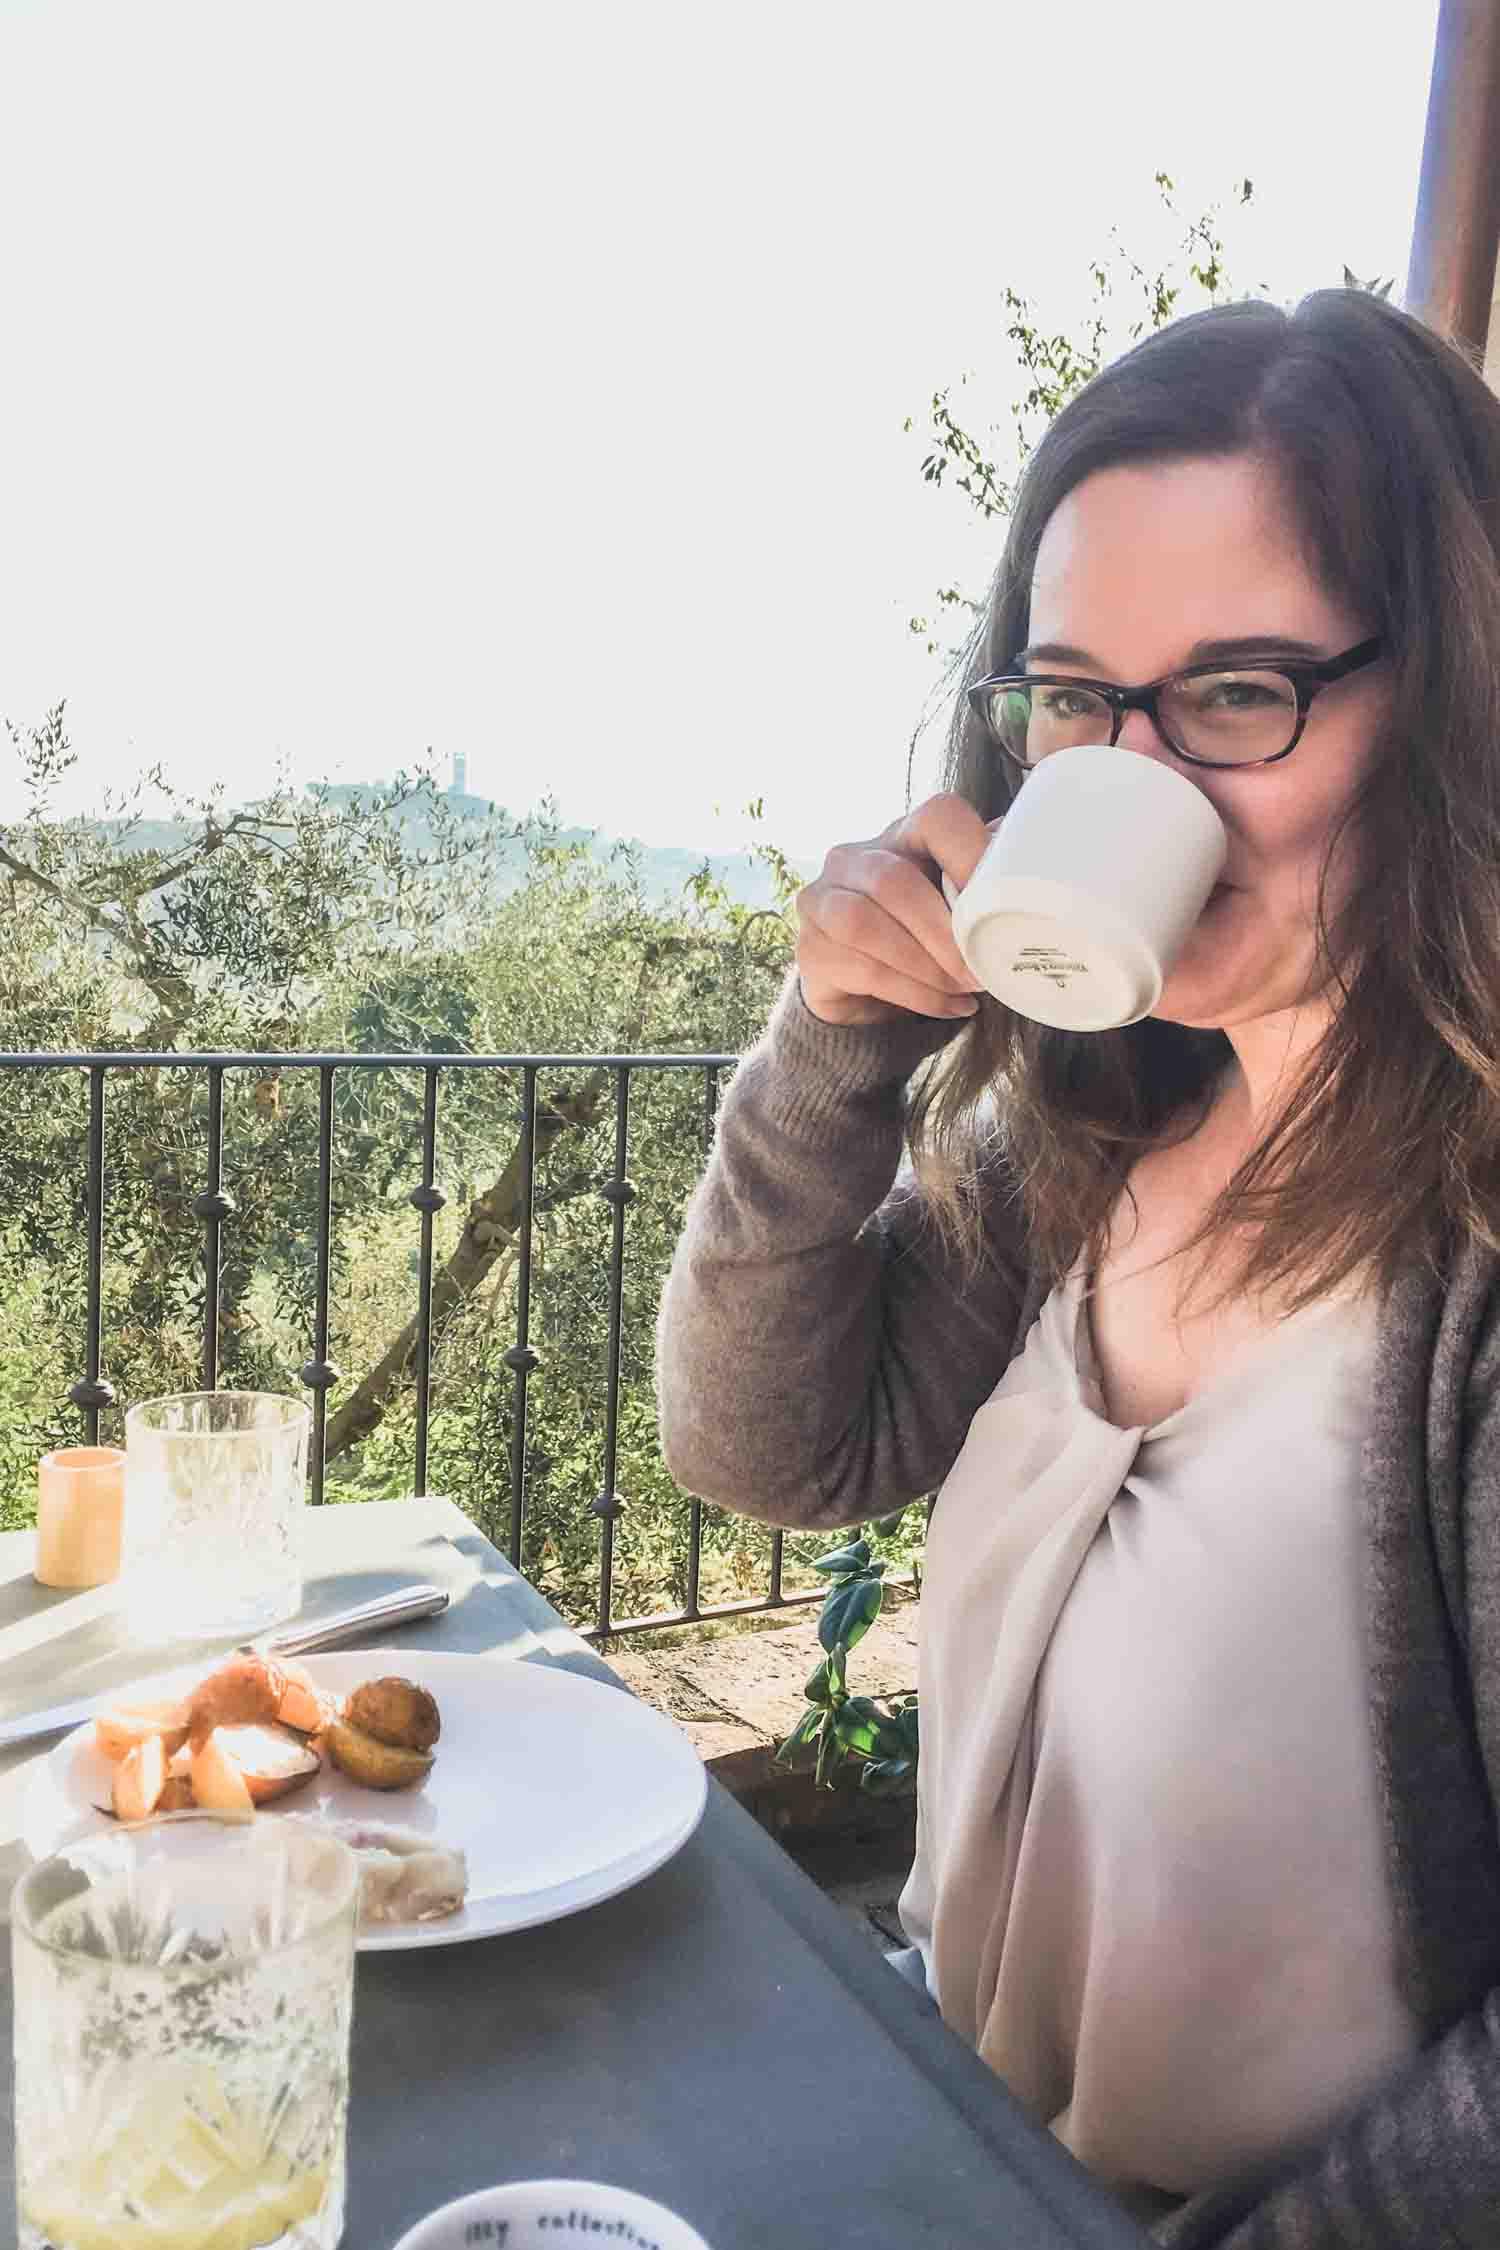 Enjoying breakfast on the patio at i pini biotique agrivilla, the organic and vegan farmhouse in Tuscany. #tuscany #travel #italy #italianfarmhouse #olivegroves #organicoliveoil #vineyards #italyinautumn #veganrestaurant #vegantravel #italytravel #veganitaly #vegantuscany #veganhotel #ecotourism #organichotel #veganhotel #veganretreat #veganbedandbreakfast #sangimignano